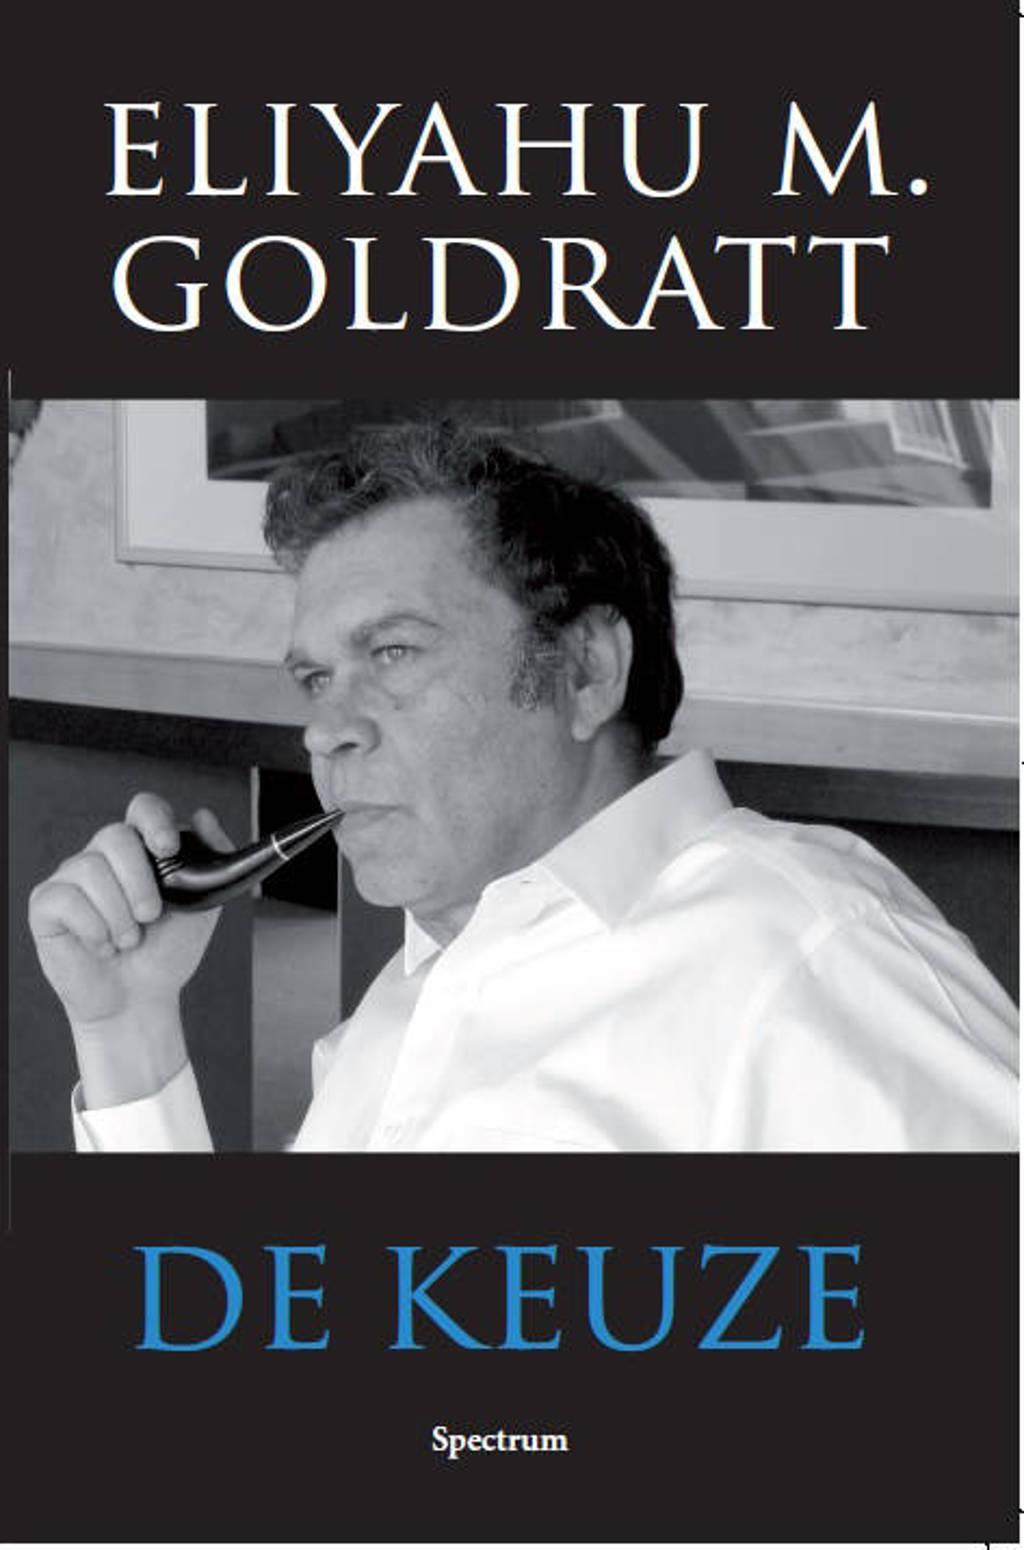 De keuze - Eliyahu M. Goldratt